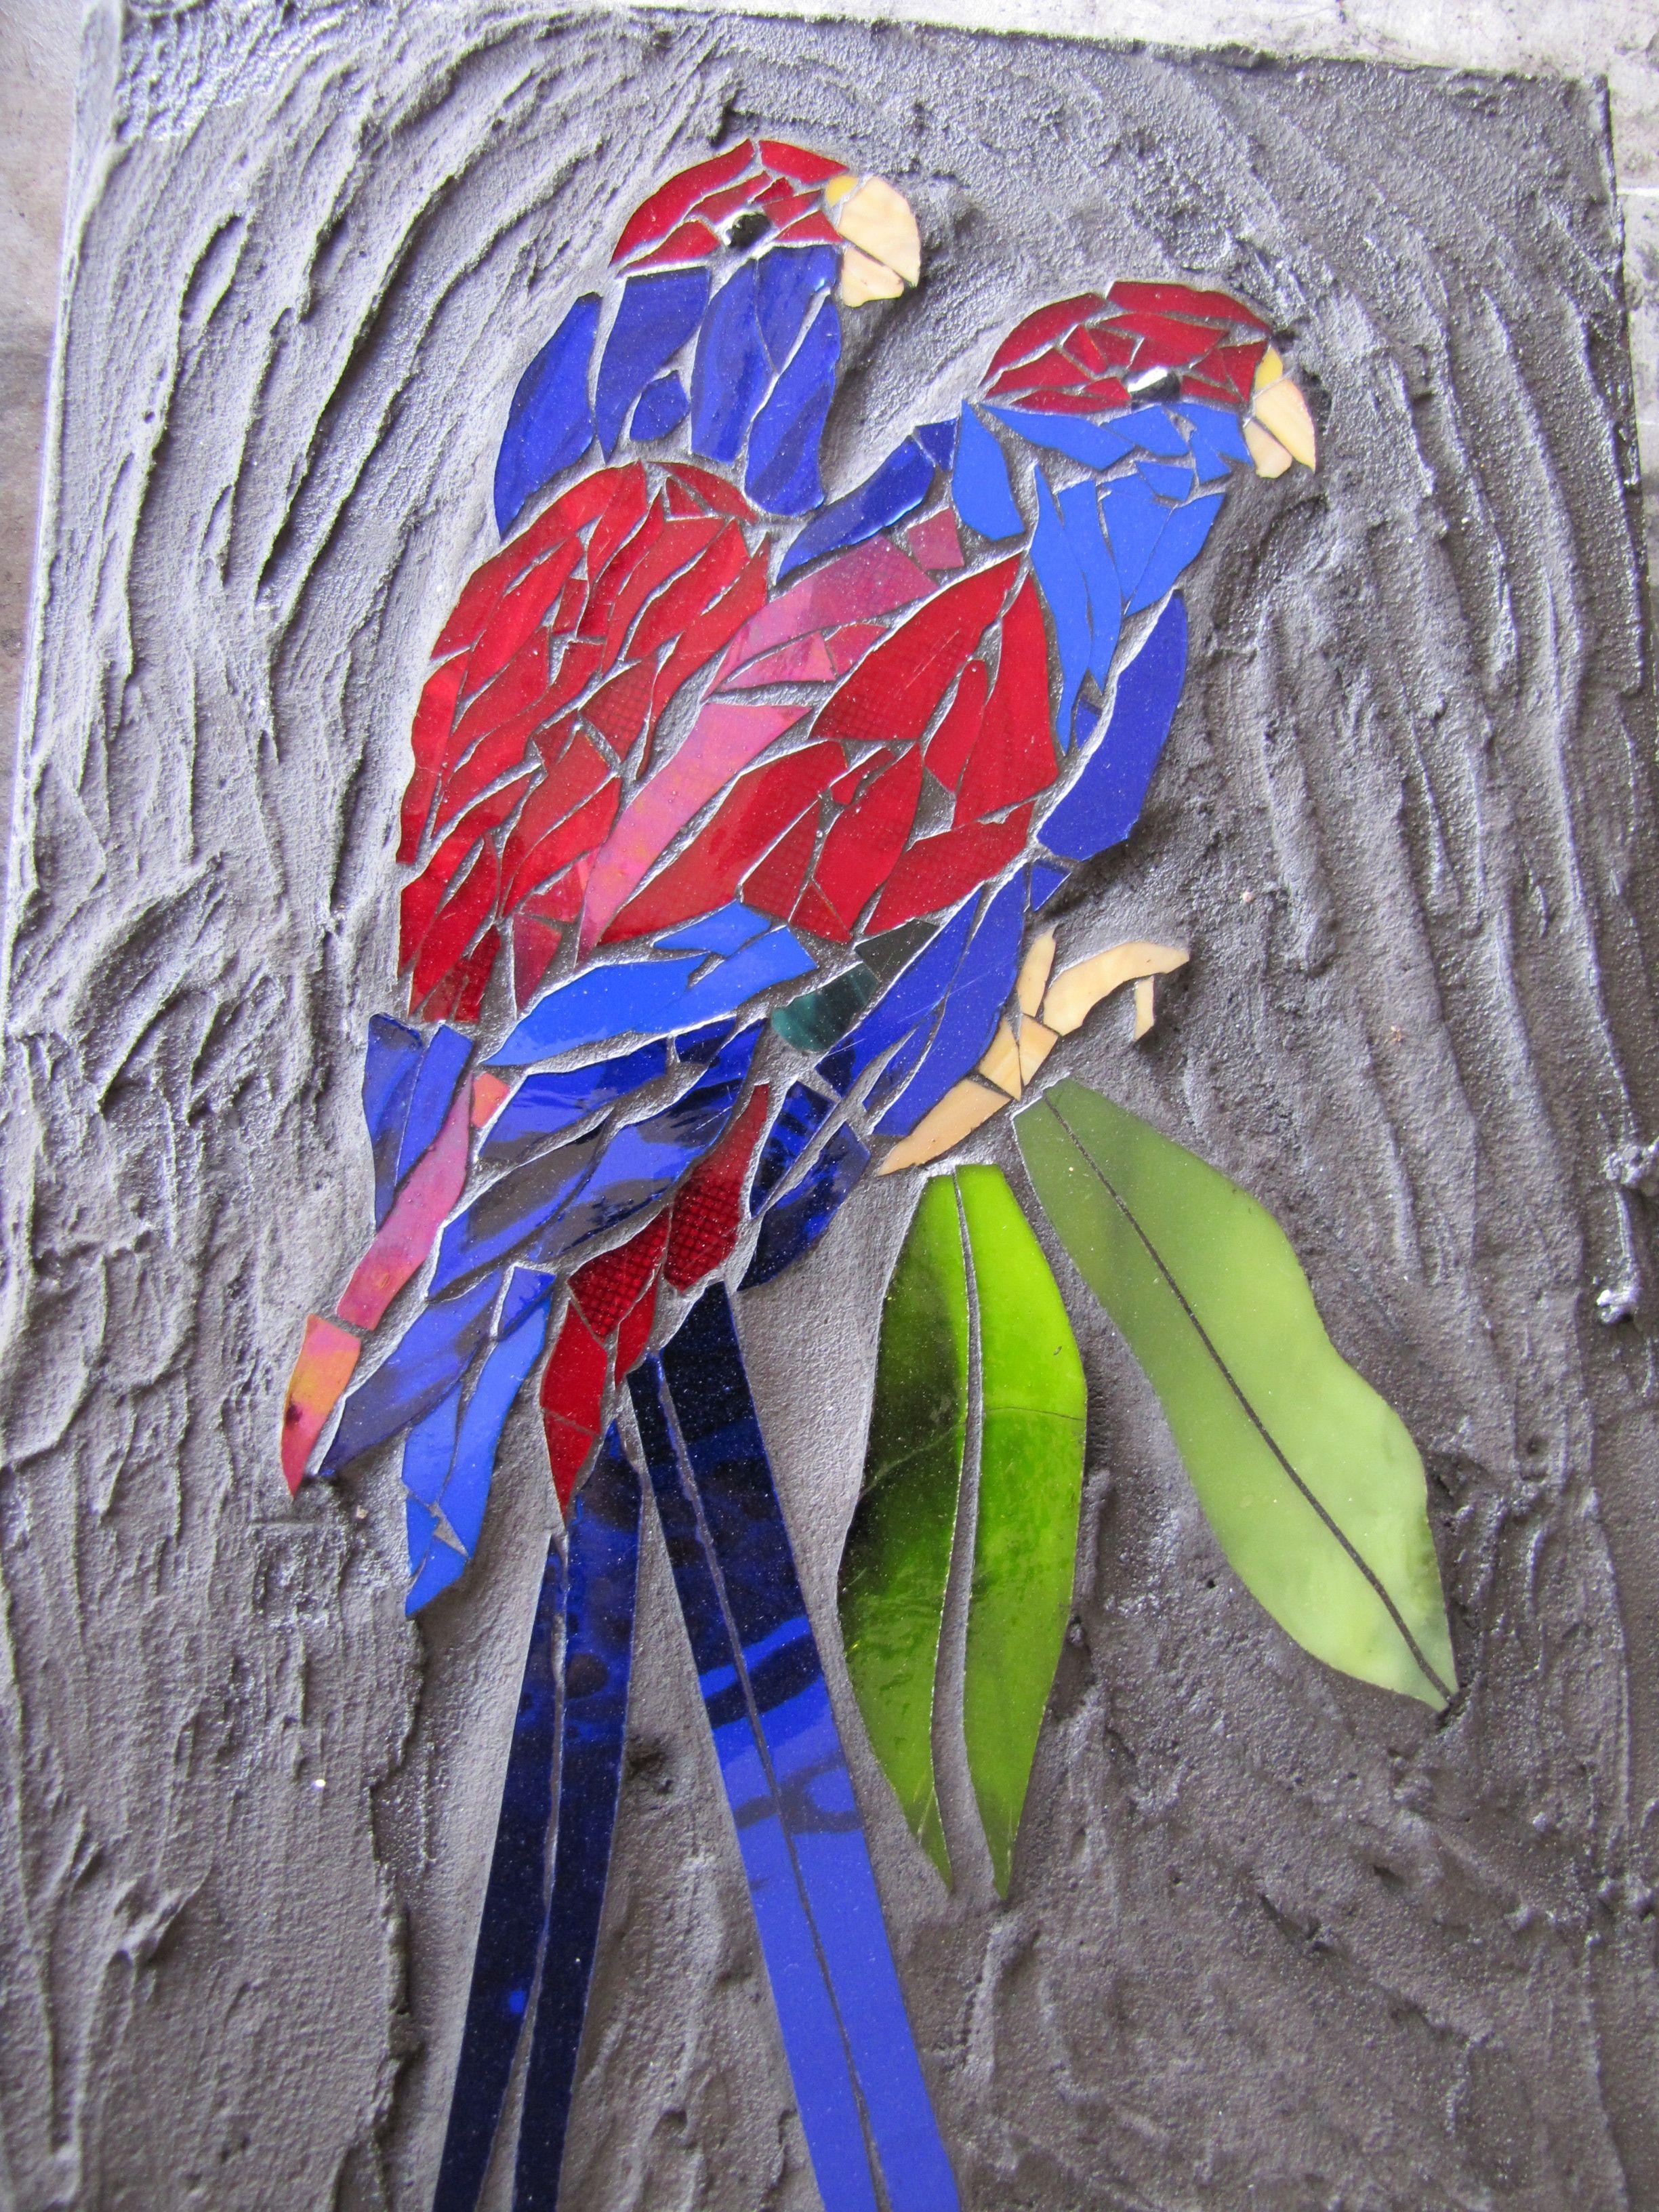 a parrot mosaic by kat gottke Mosaic animals, Mosaic